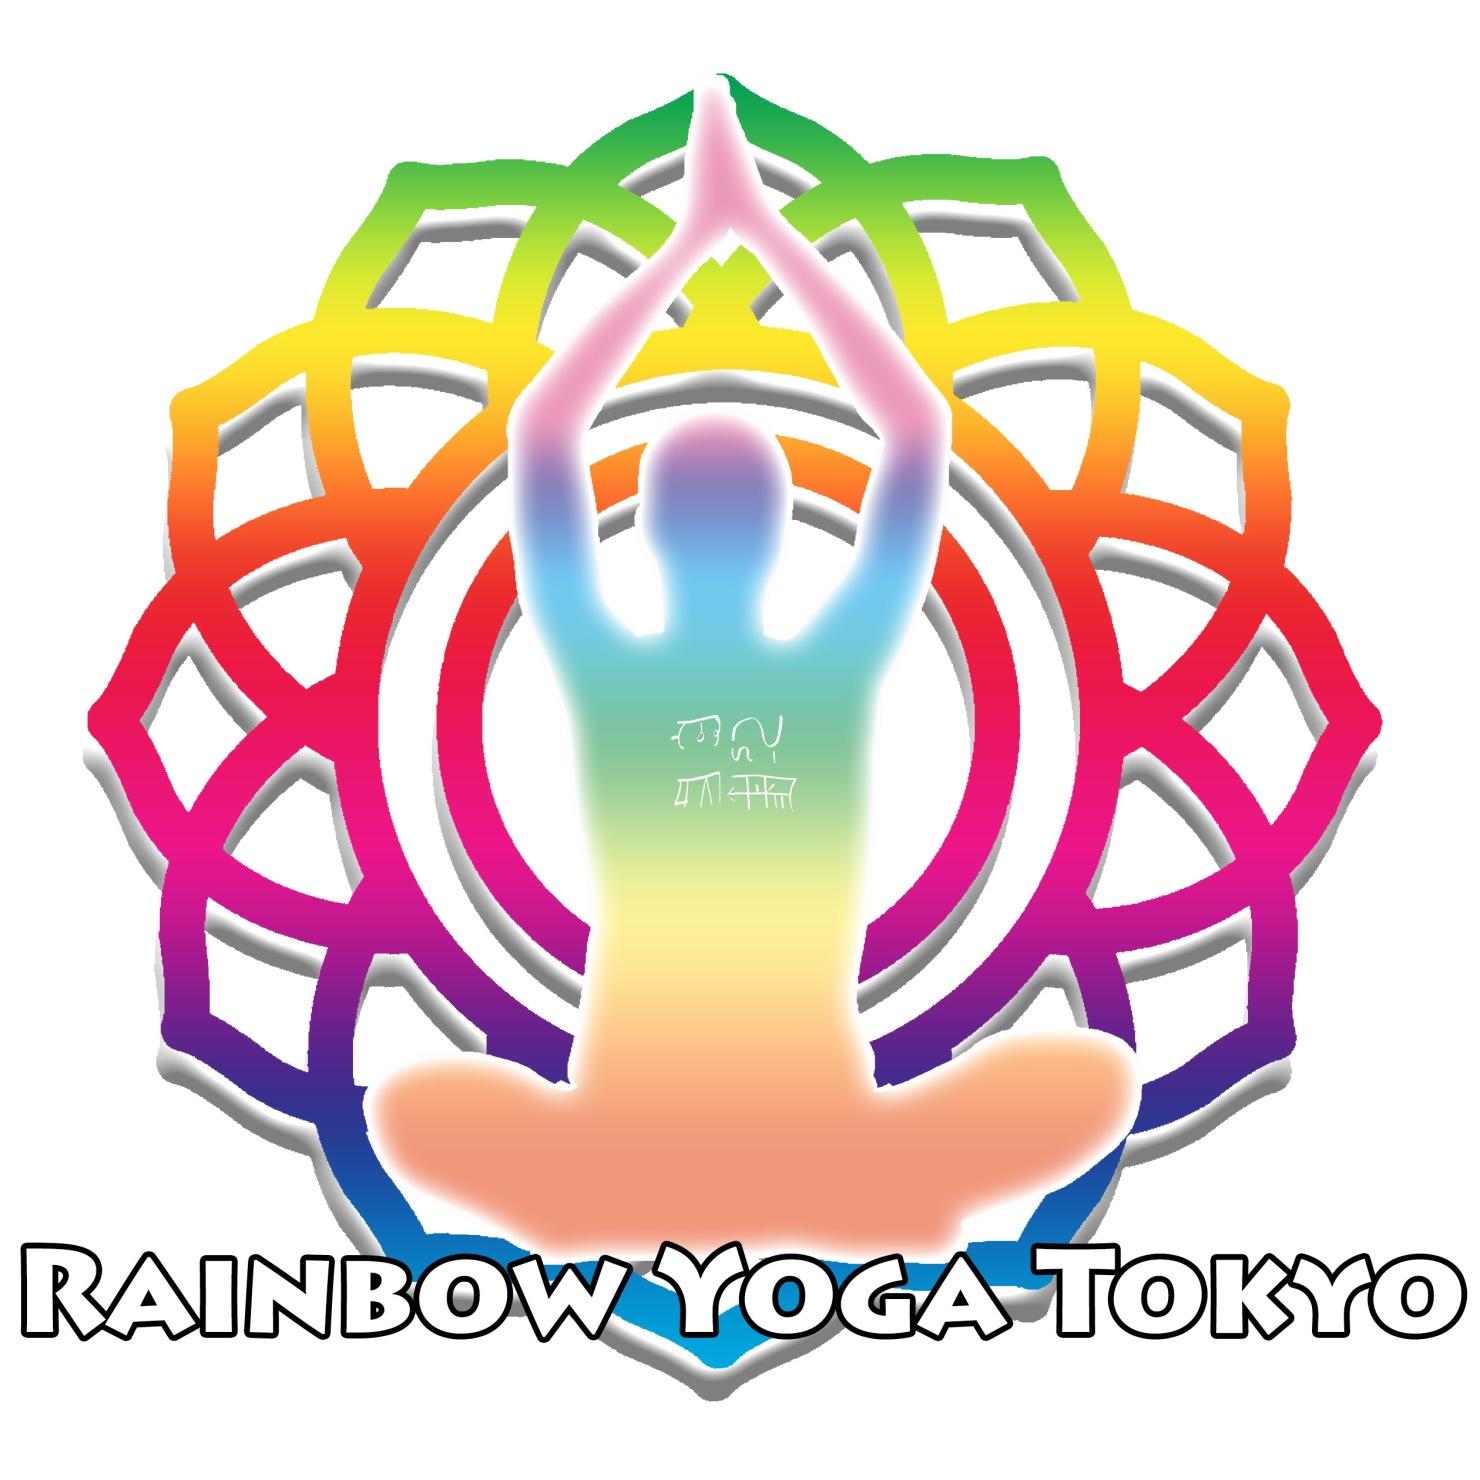 RAINBOW YOGA TOKYO 新橋クラスの画像